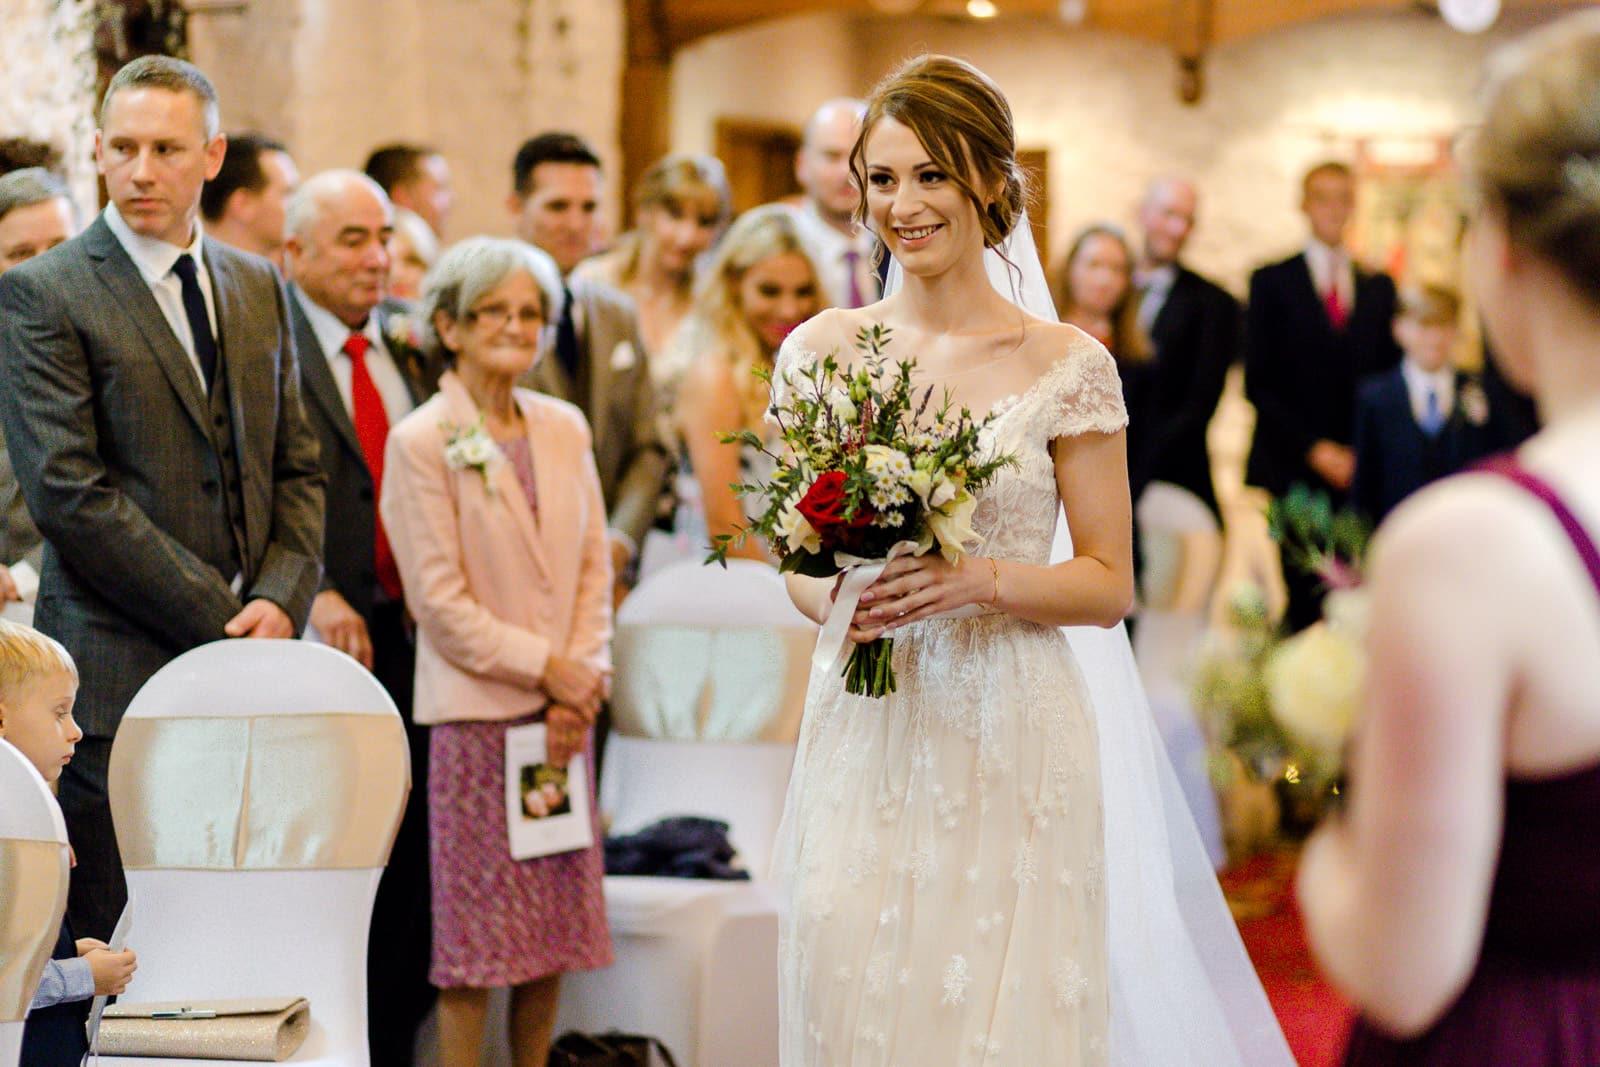 Miskin Manor Wedding Photography - Art by Design Photography